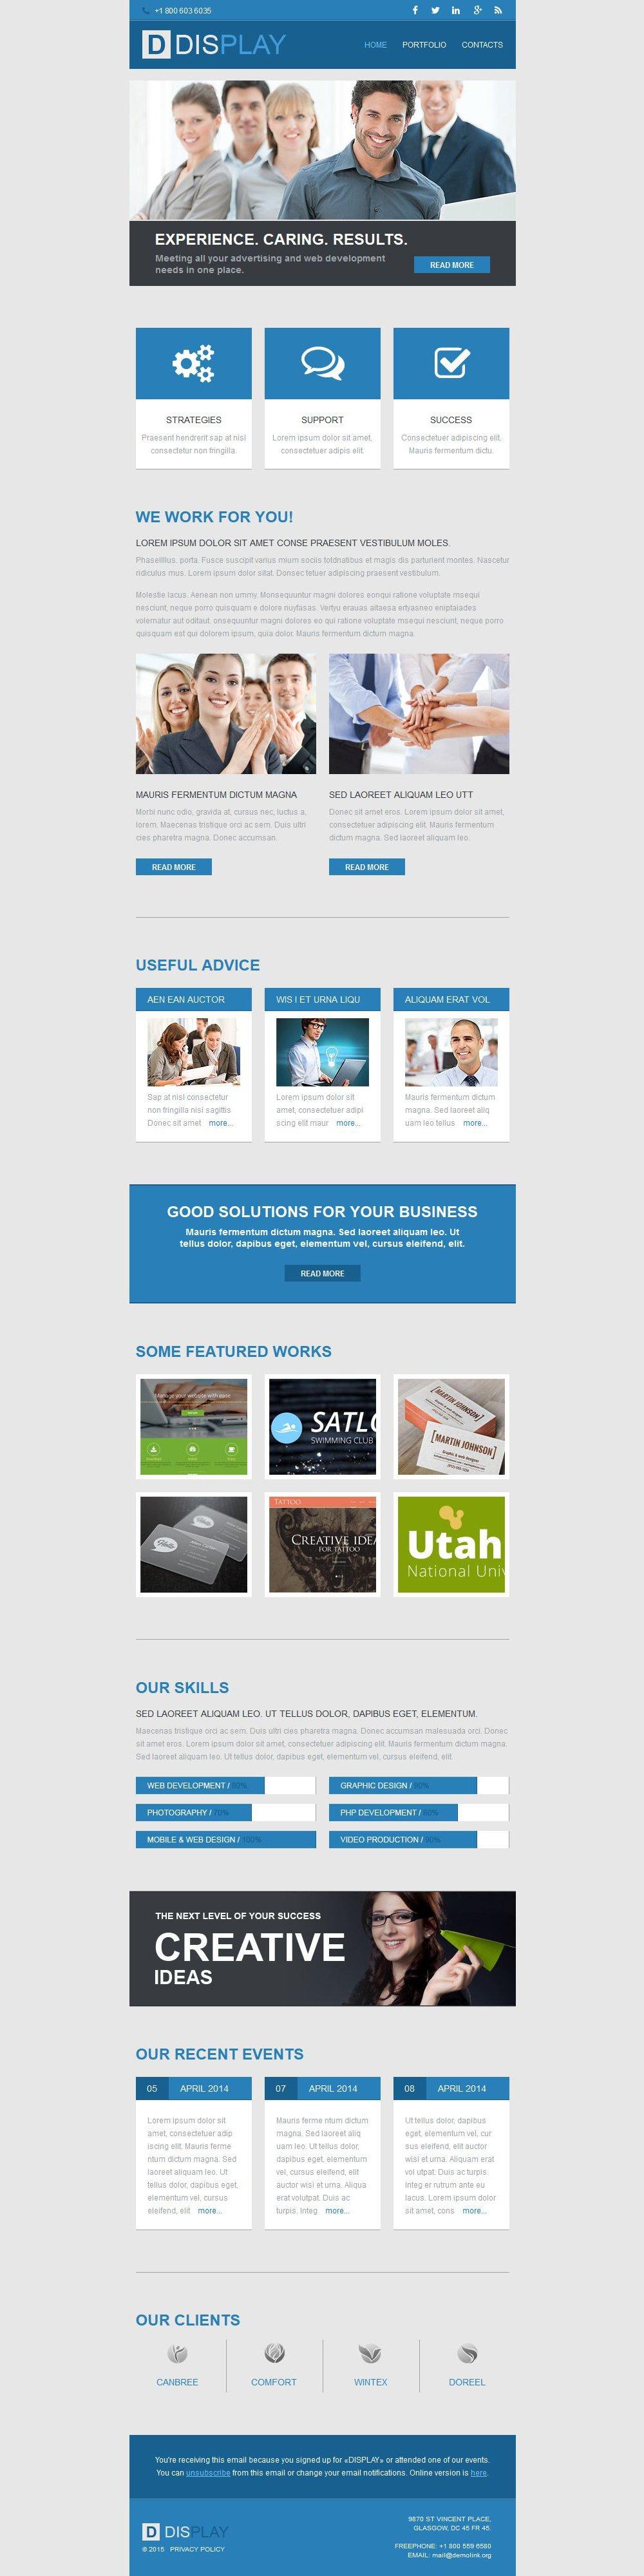 Web Design Responsive Newsletter Template #52682